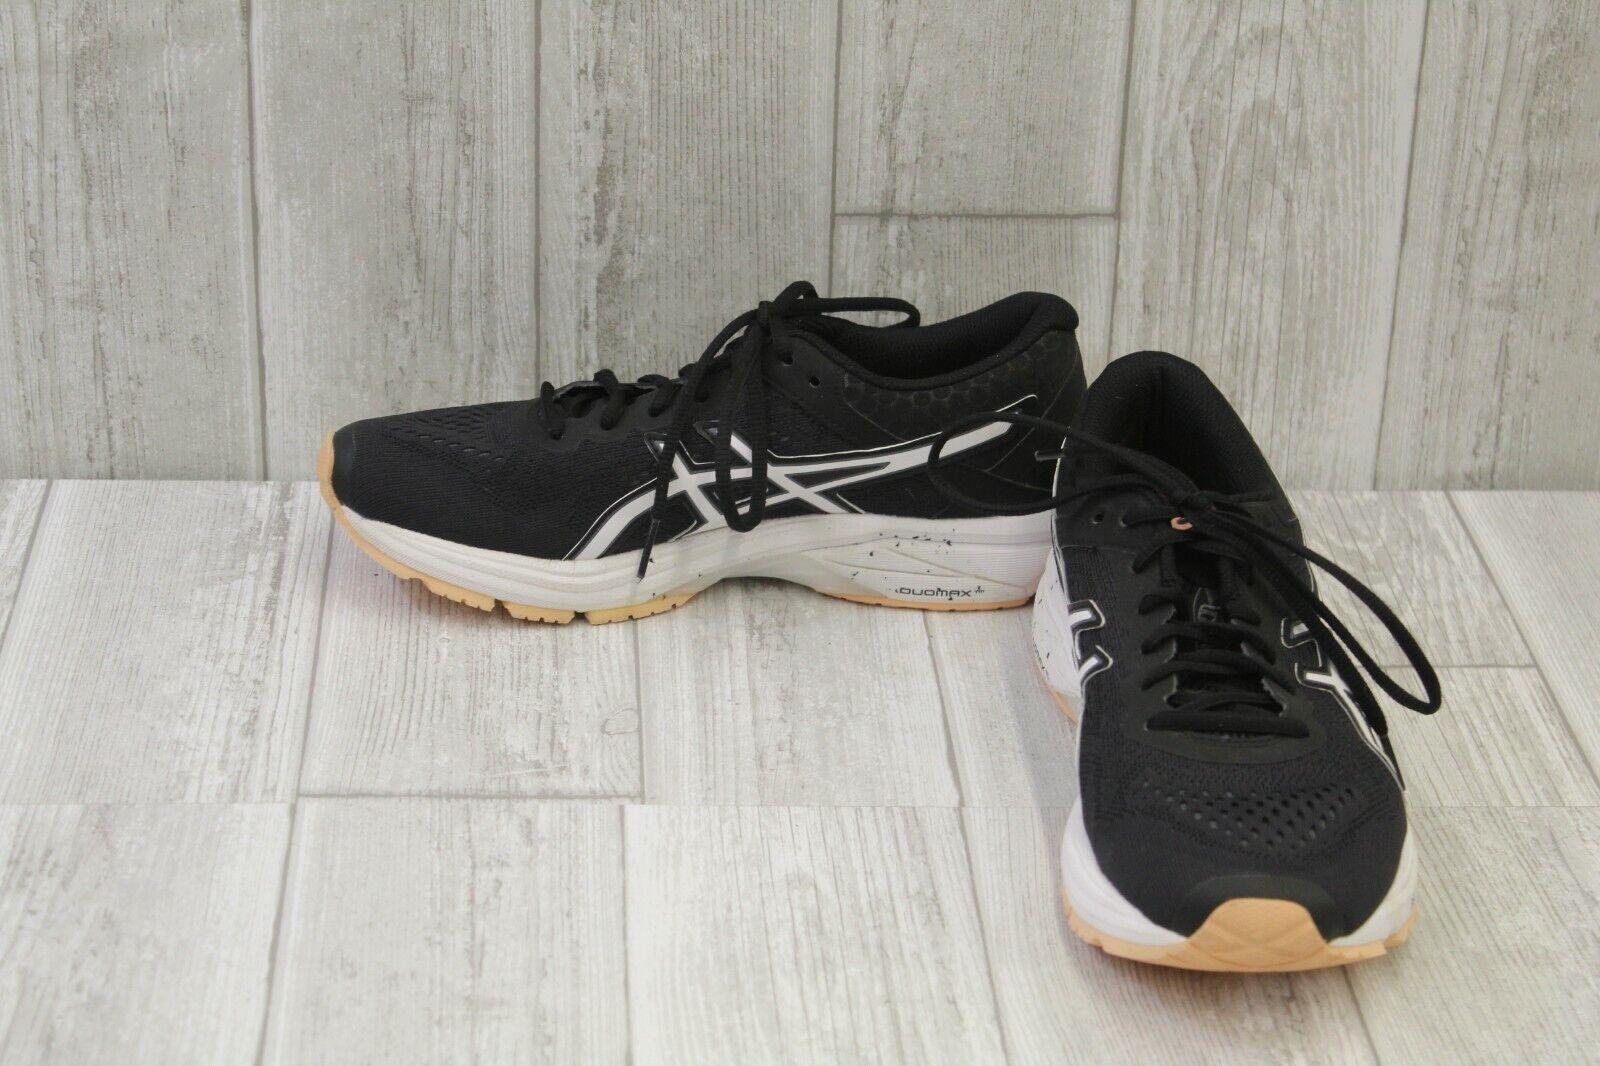 ASICS GT-1000 6 Running Running Running scarpe, Donna  Dimensione 8.5, nero bianca Peach 9bf3ac